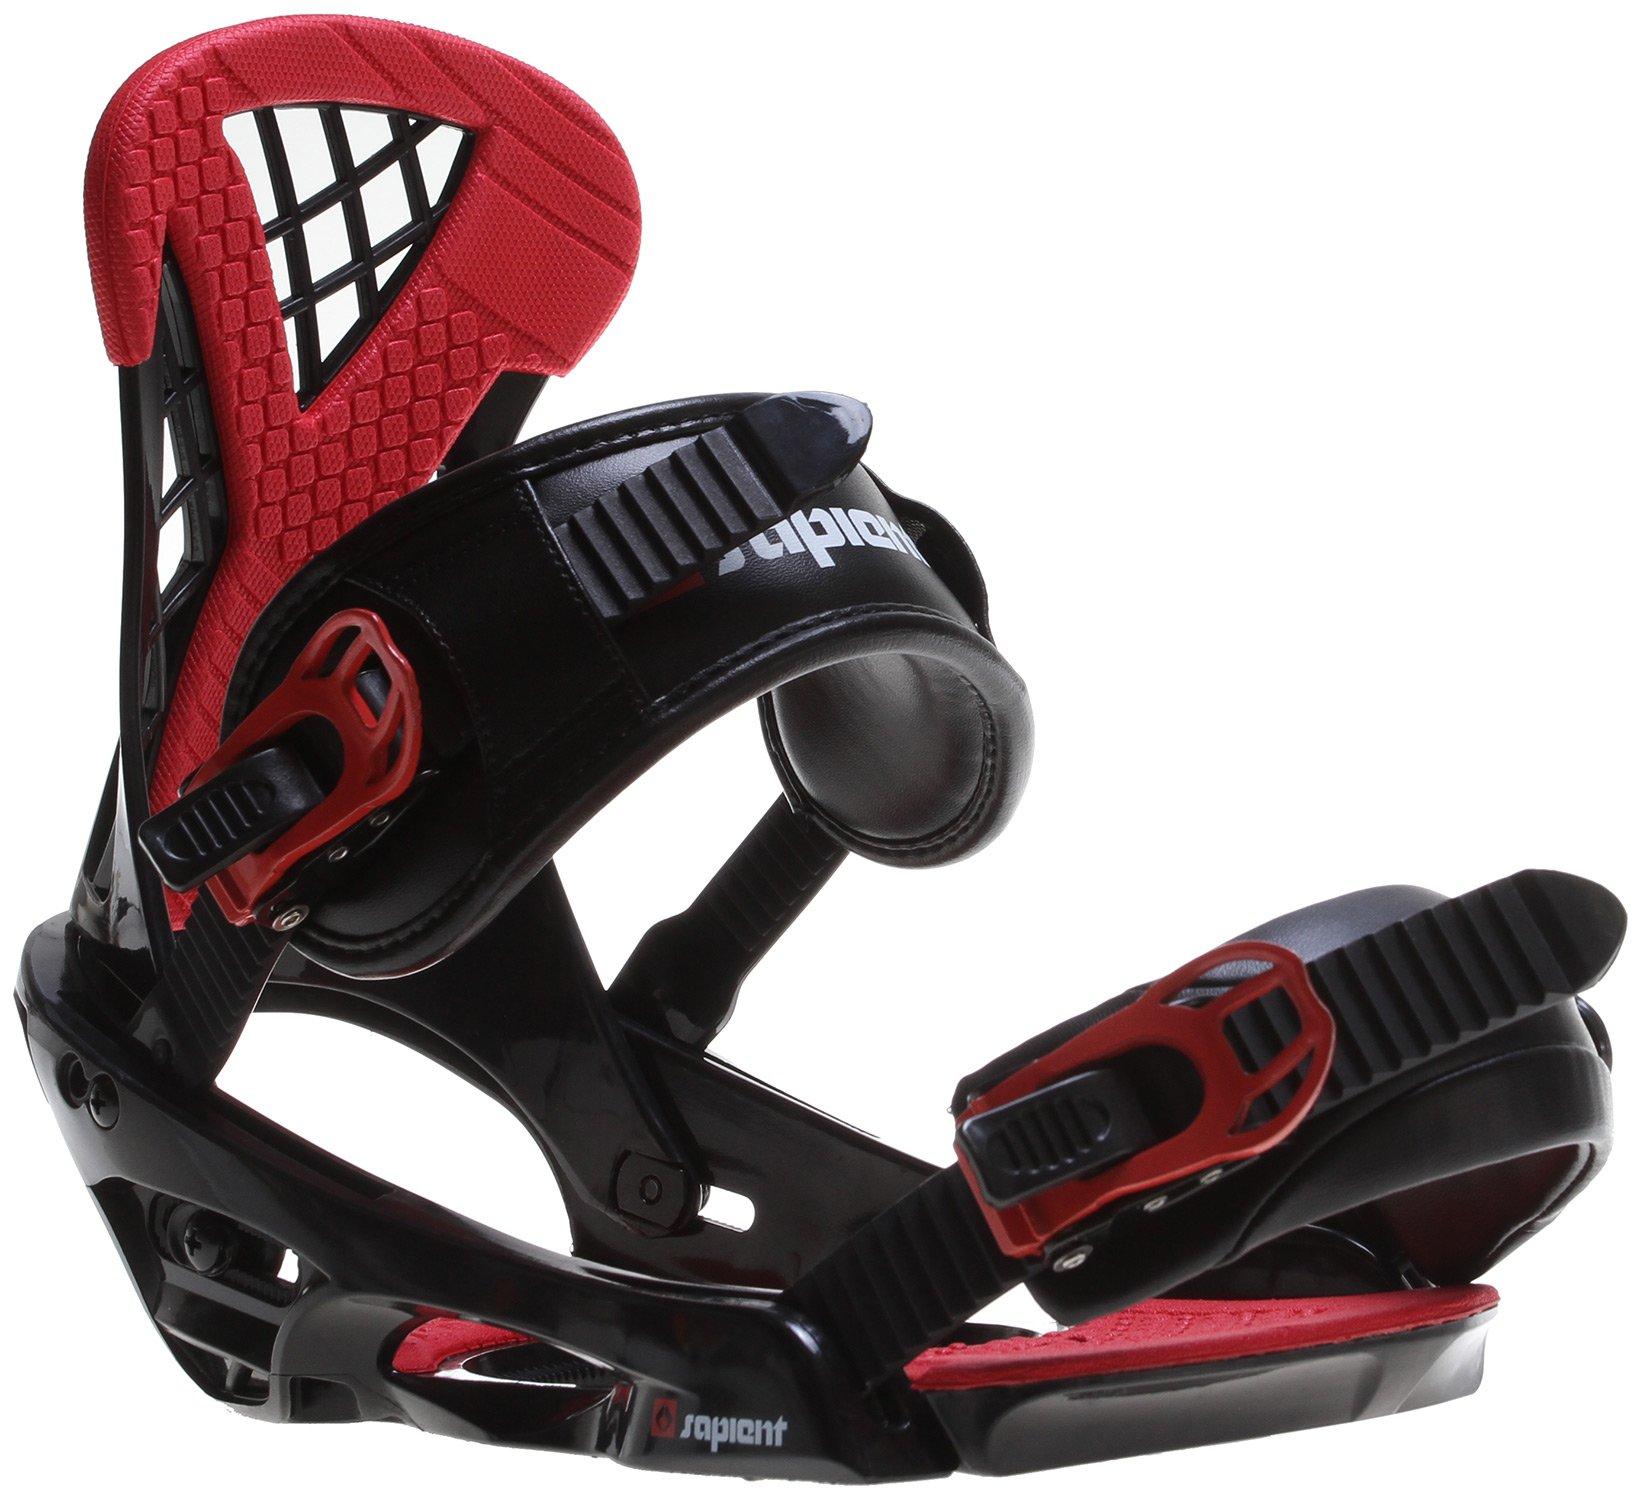 Sapient Wisdom Snowboard Bindings Black/Red Mens Sz M/L (8-12) by Sapient